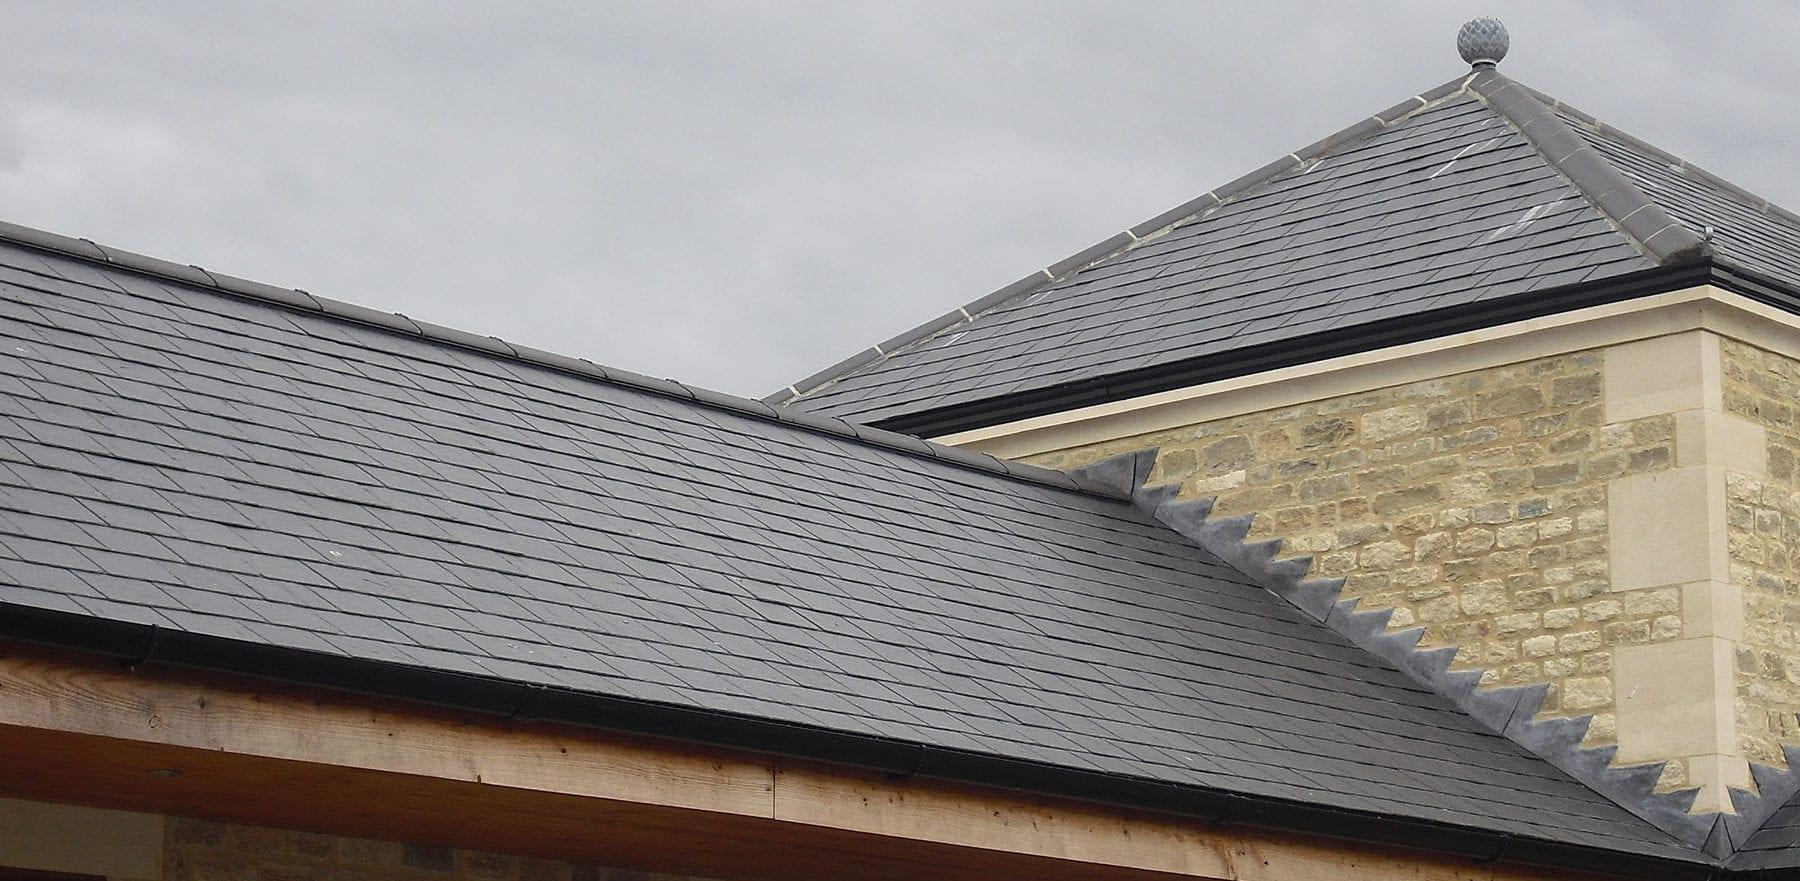 Lifestiles - Spanish Natural Slate Roof Tiles - Wiltshire, England